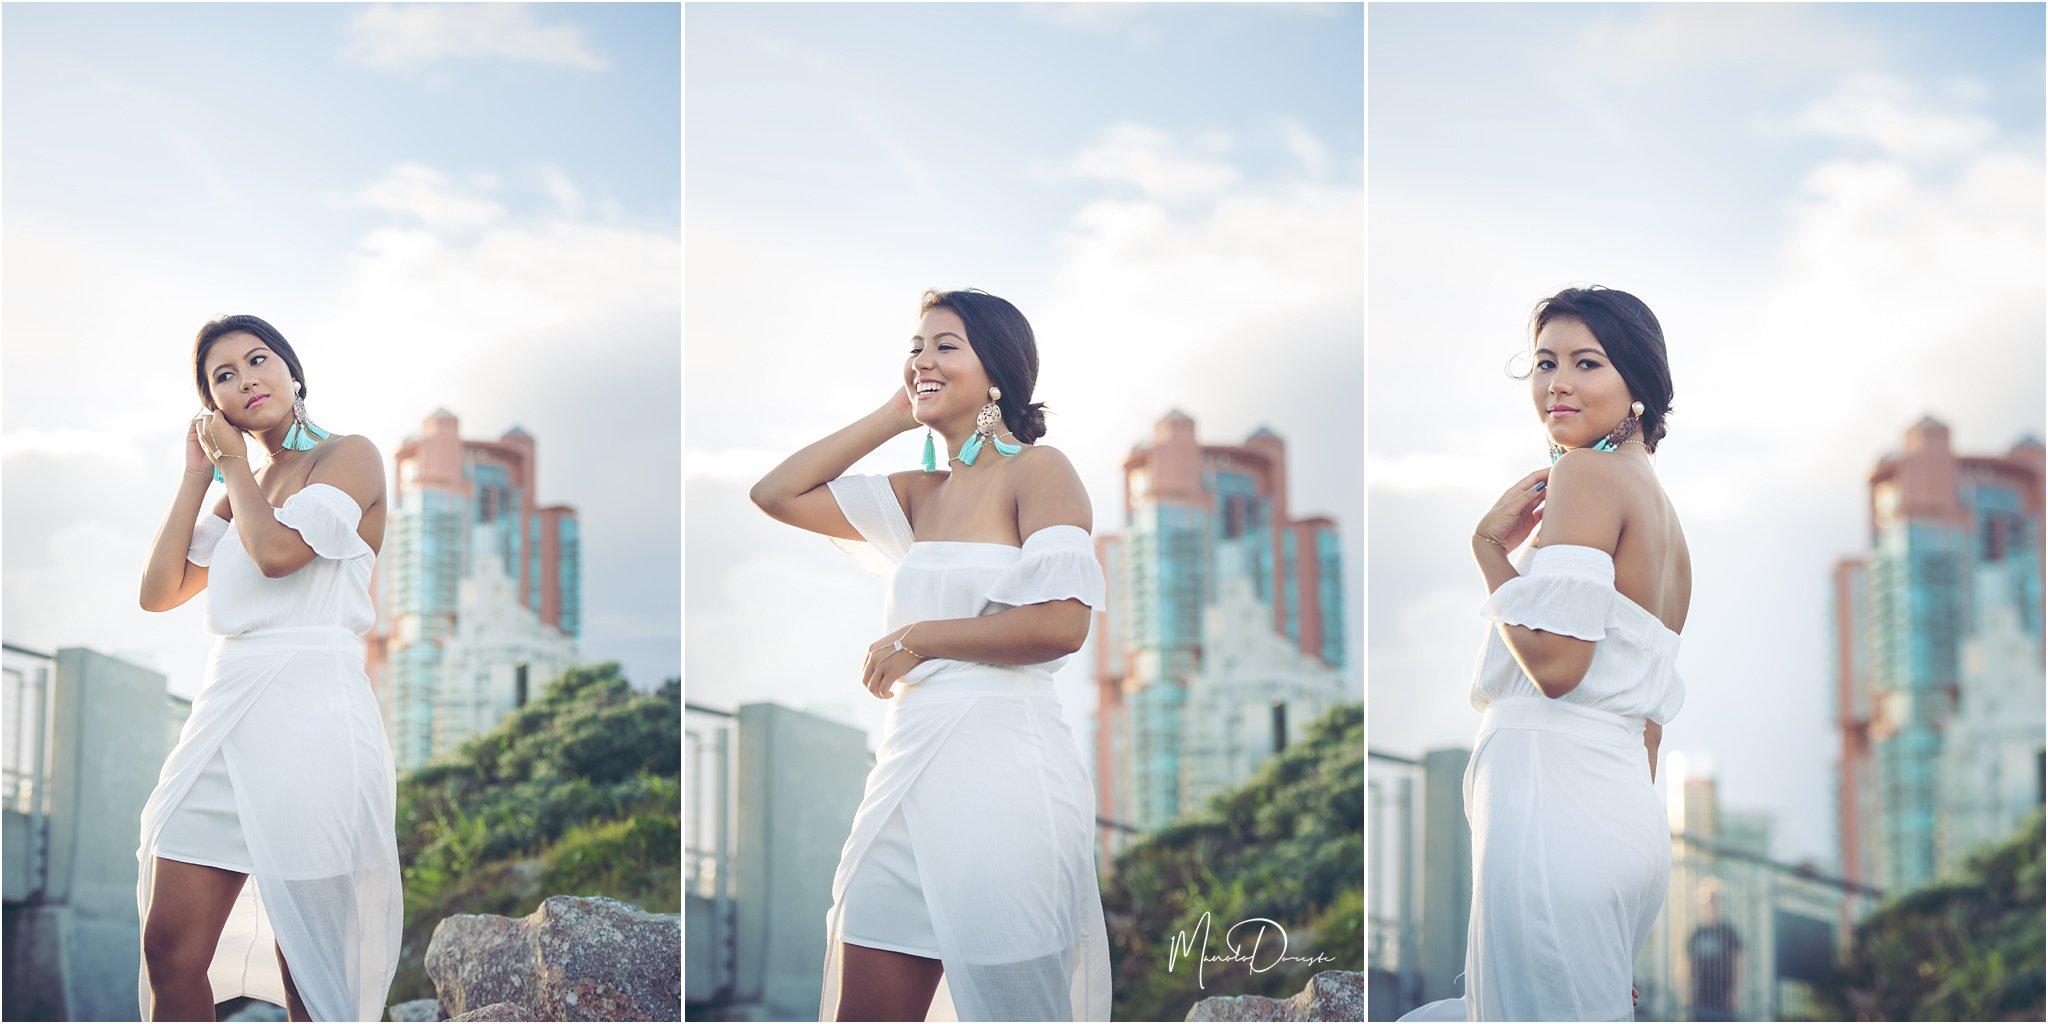 0242_ManoloDoreste_InFocusStudios_Wedding_Family_Photography_Miami_MiamiPhotographer.jpg